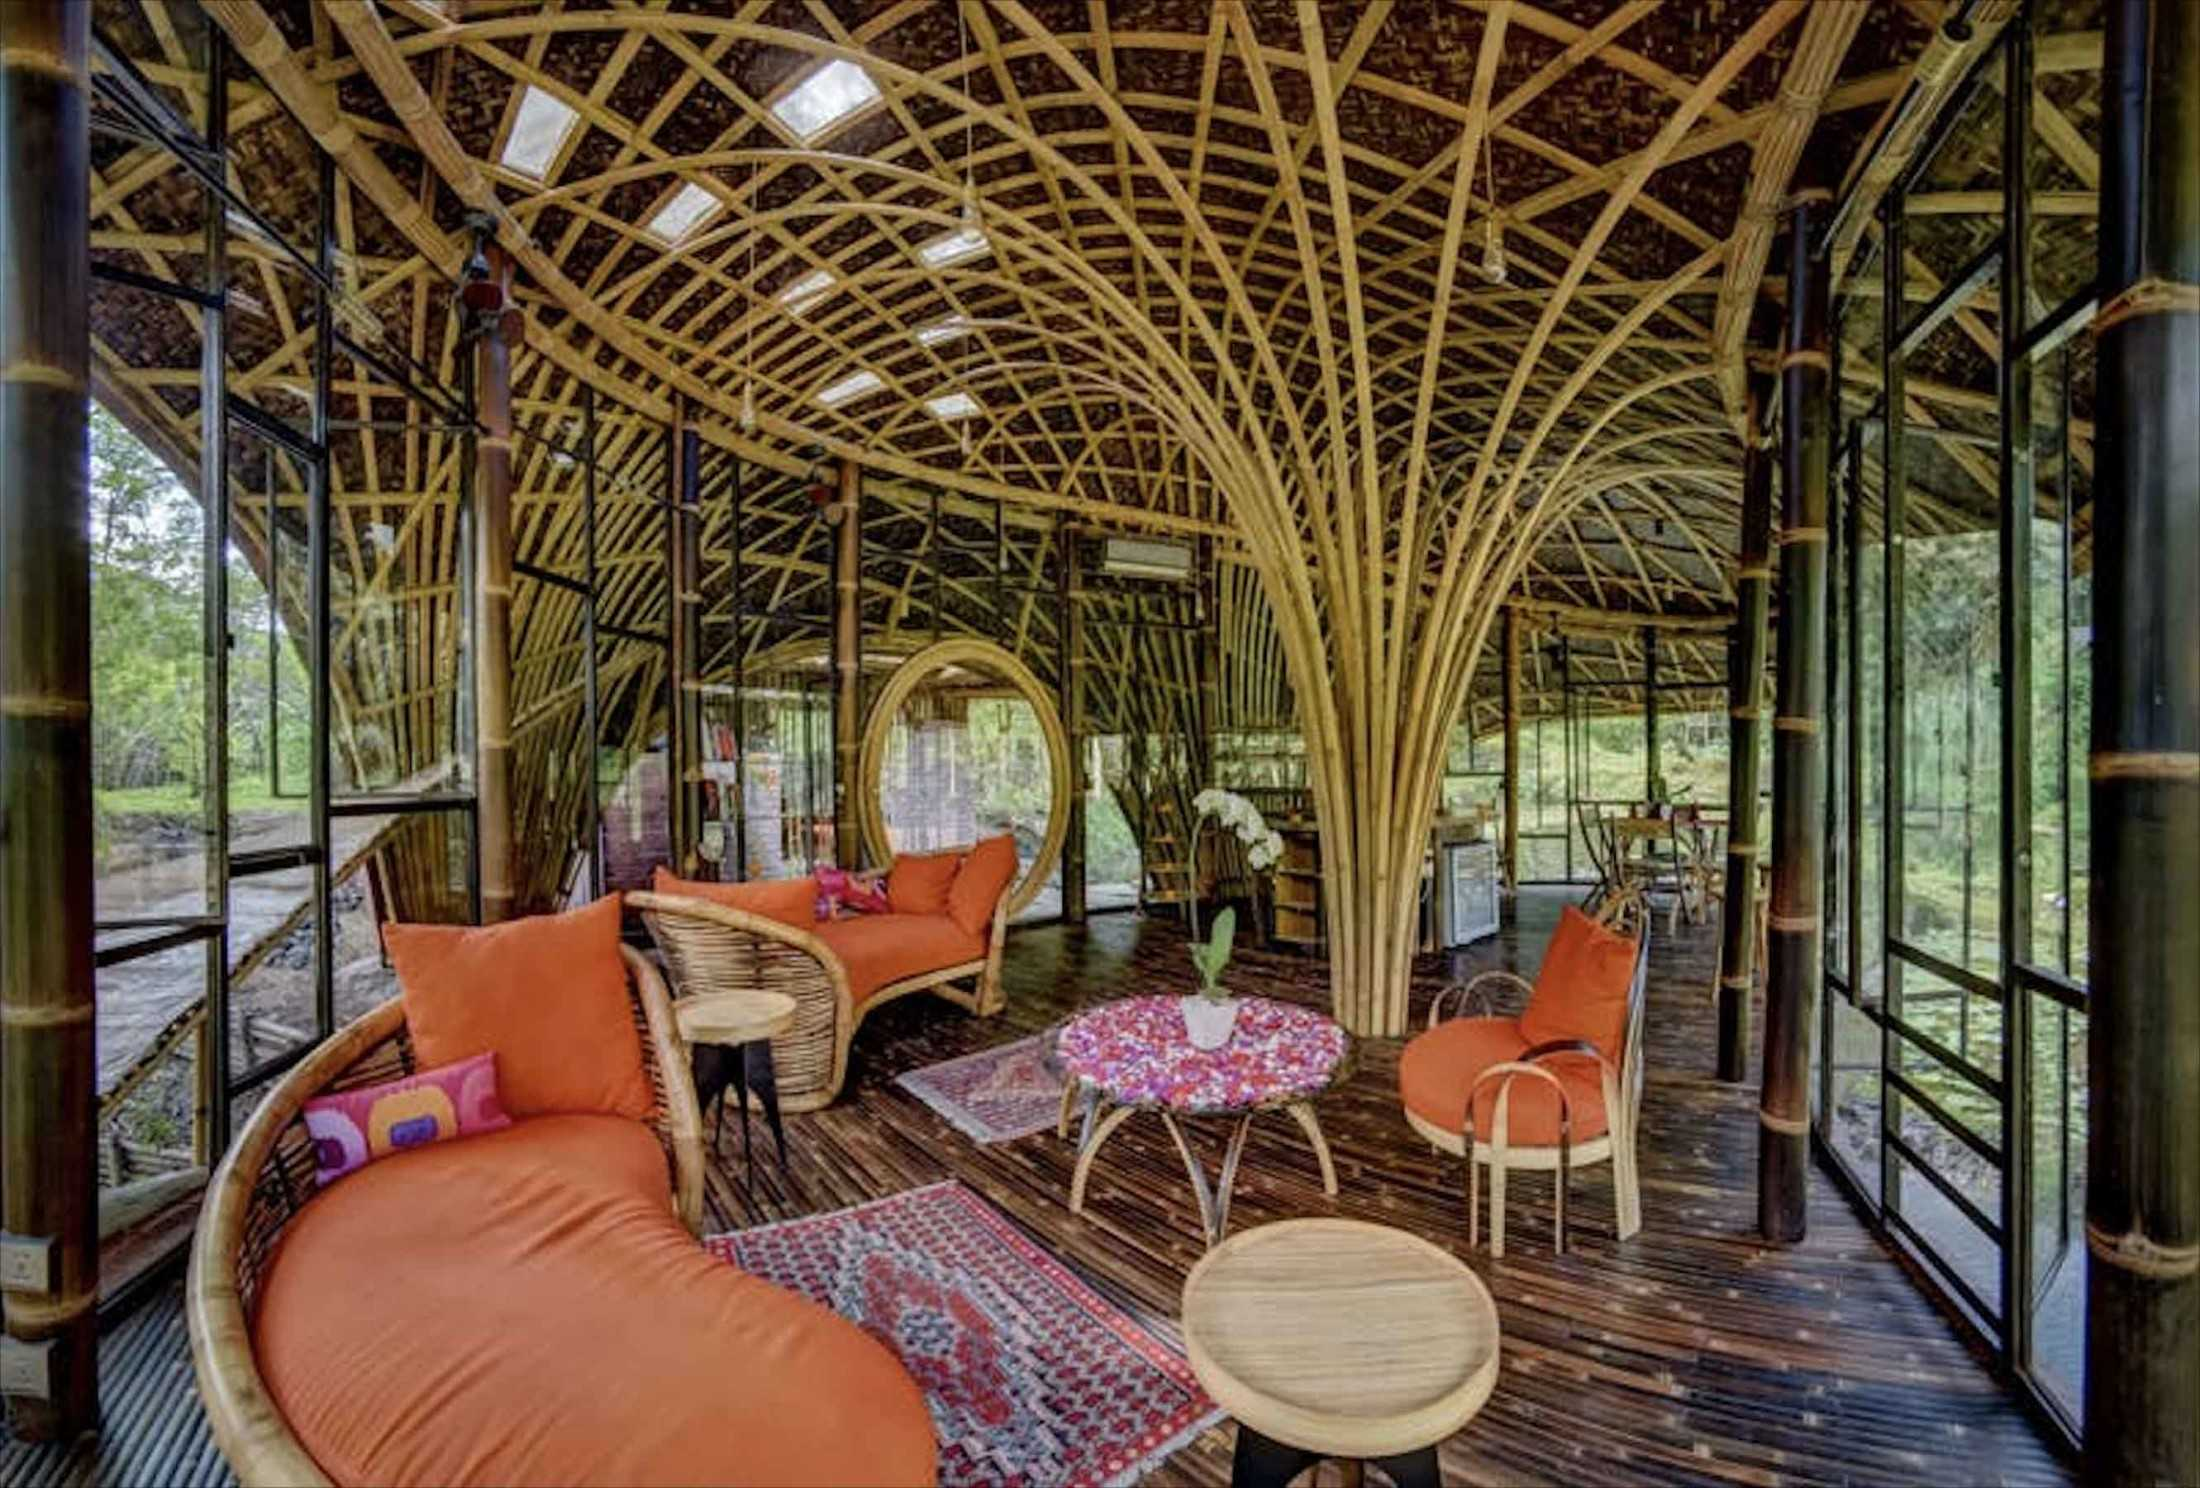 Agung Budi Raharsa | Architecture & Engineering Riverbend Bamboo House - Bali Bali, Indonesia Bali, Indonesia Agung-Budi-Raharsa-Riverbend-House-Bali  88710